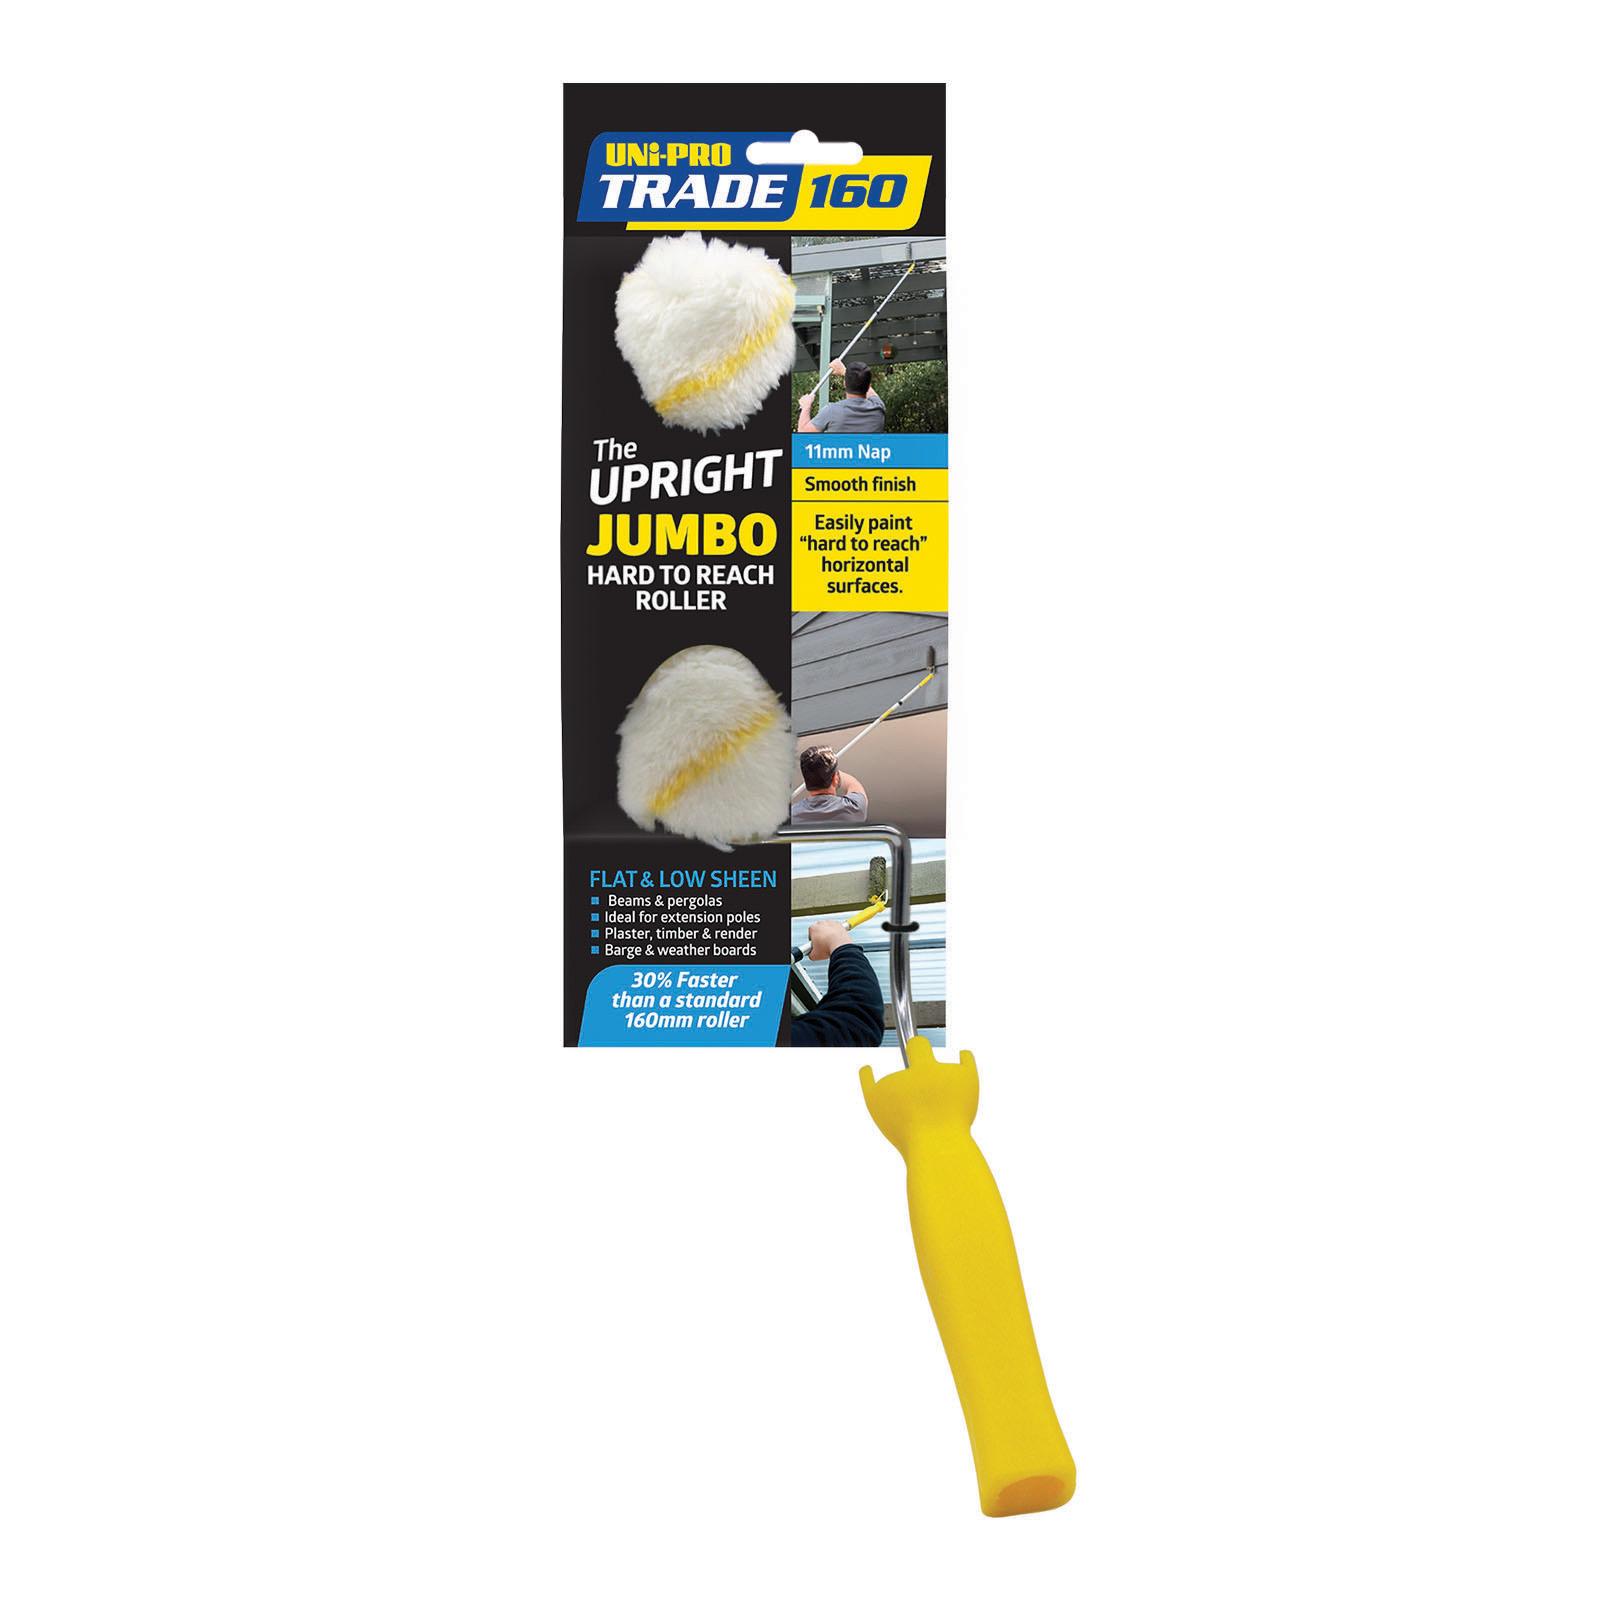 UNi-PRO Trade Upright Jumbo Roller Set - 11mm nap